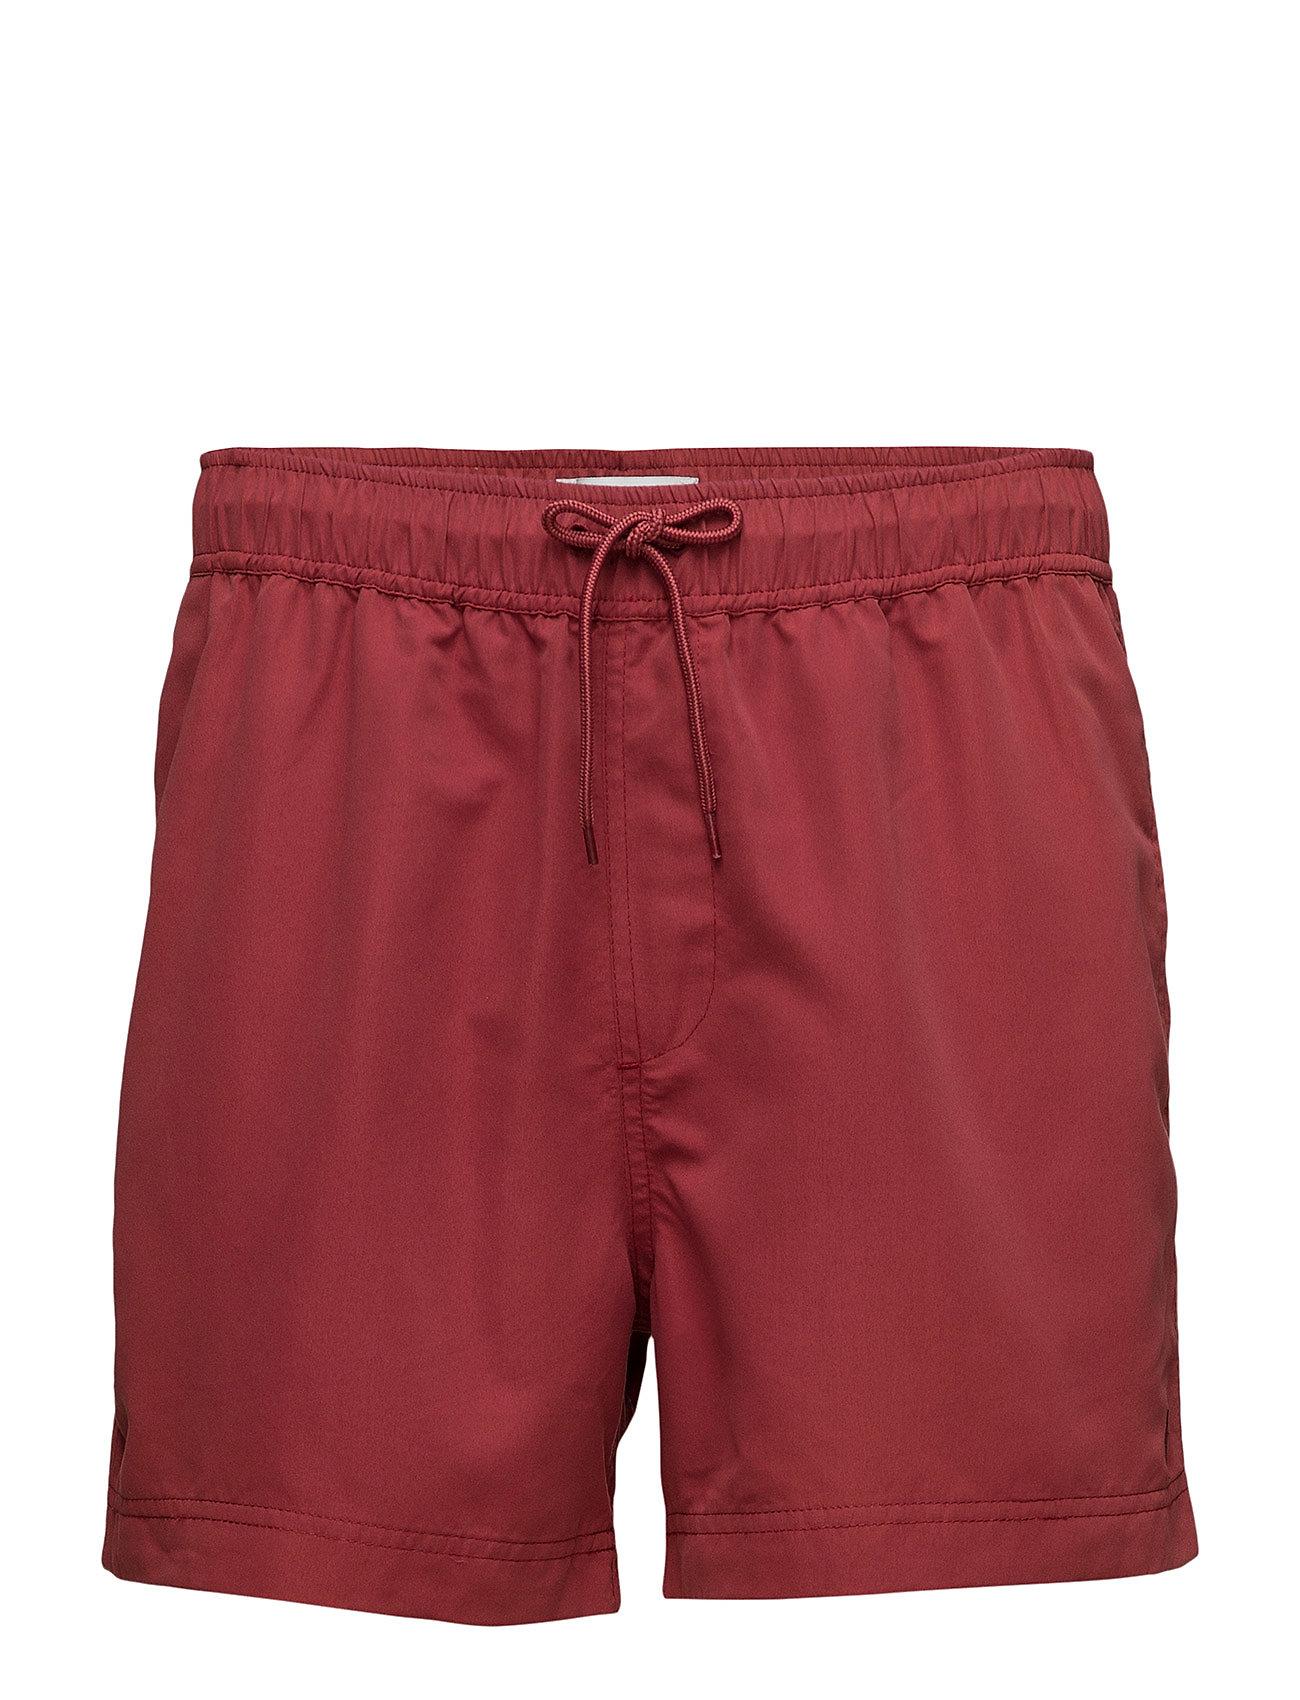 Shorts RedSamsøeamp; Swim Mason 6956brick JlF1cTK3